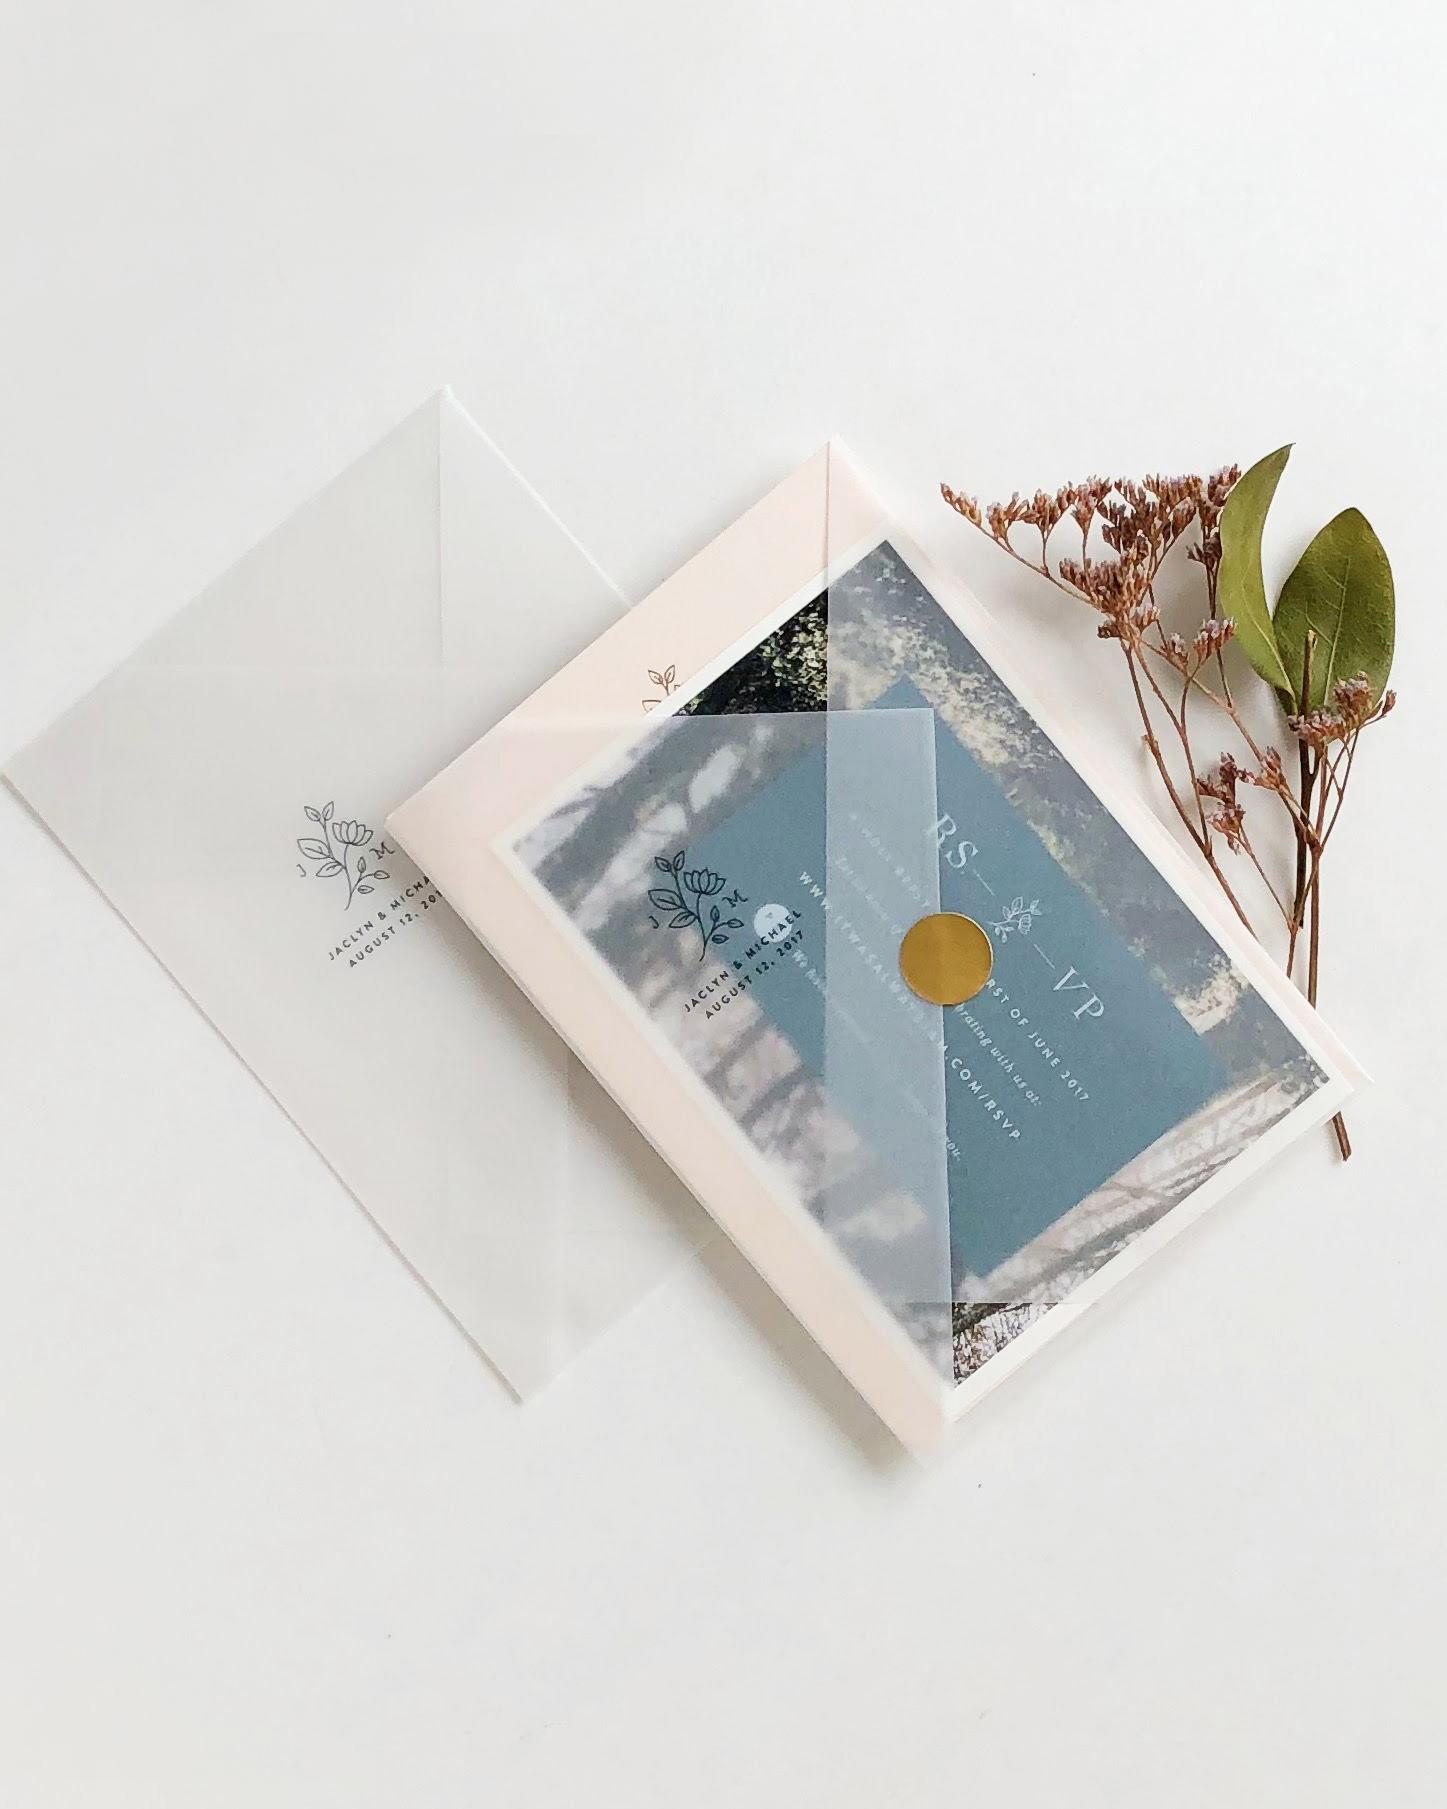 vellum envelope with printed logo